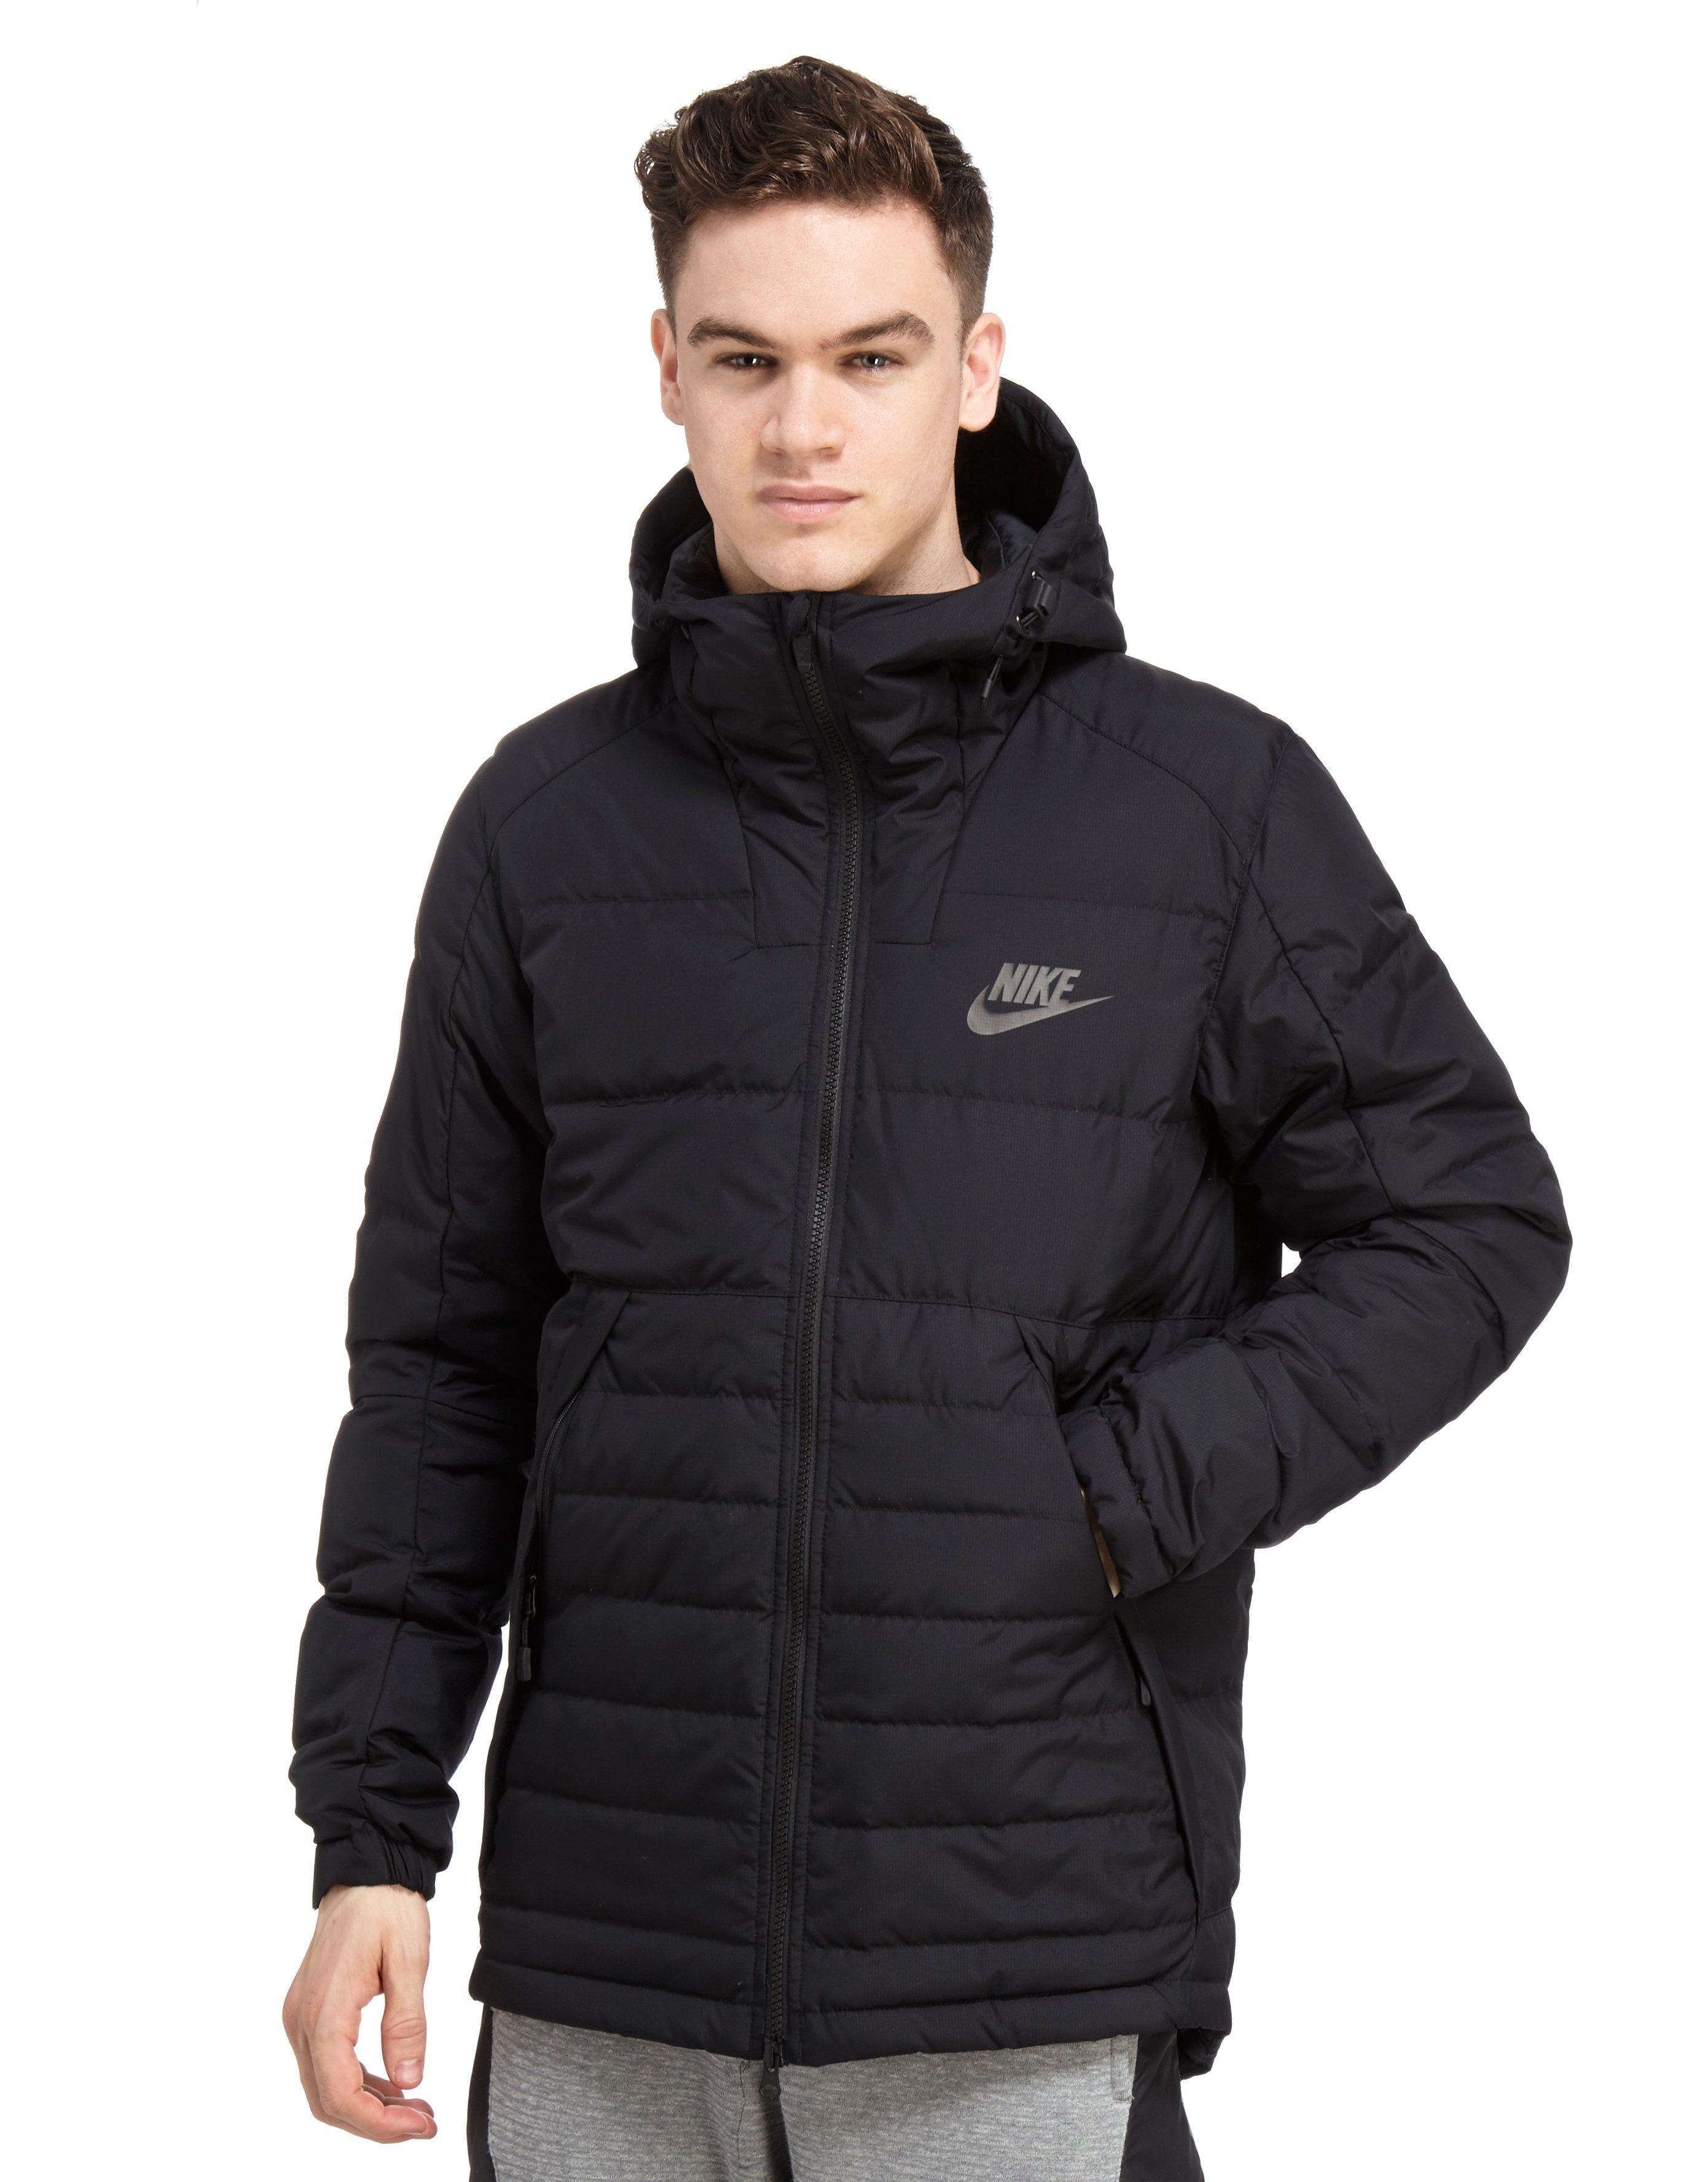 b02df39017d3 Black Puffer Vest Men Nike